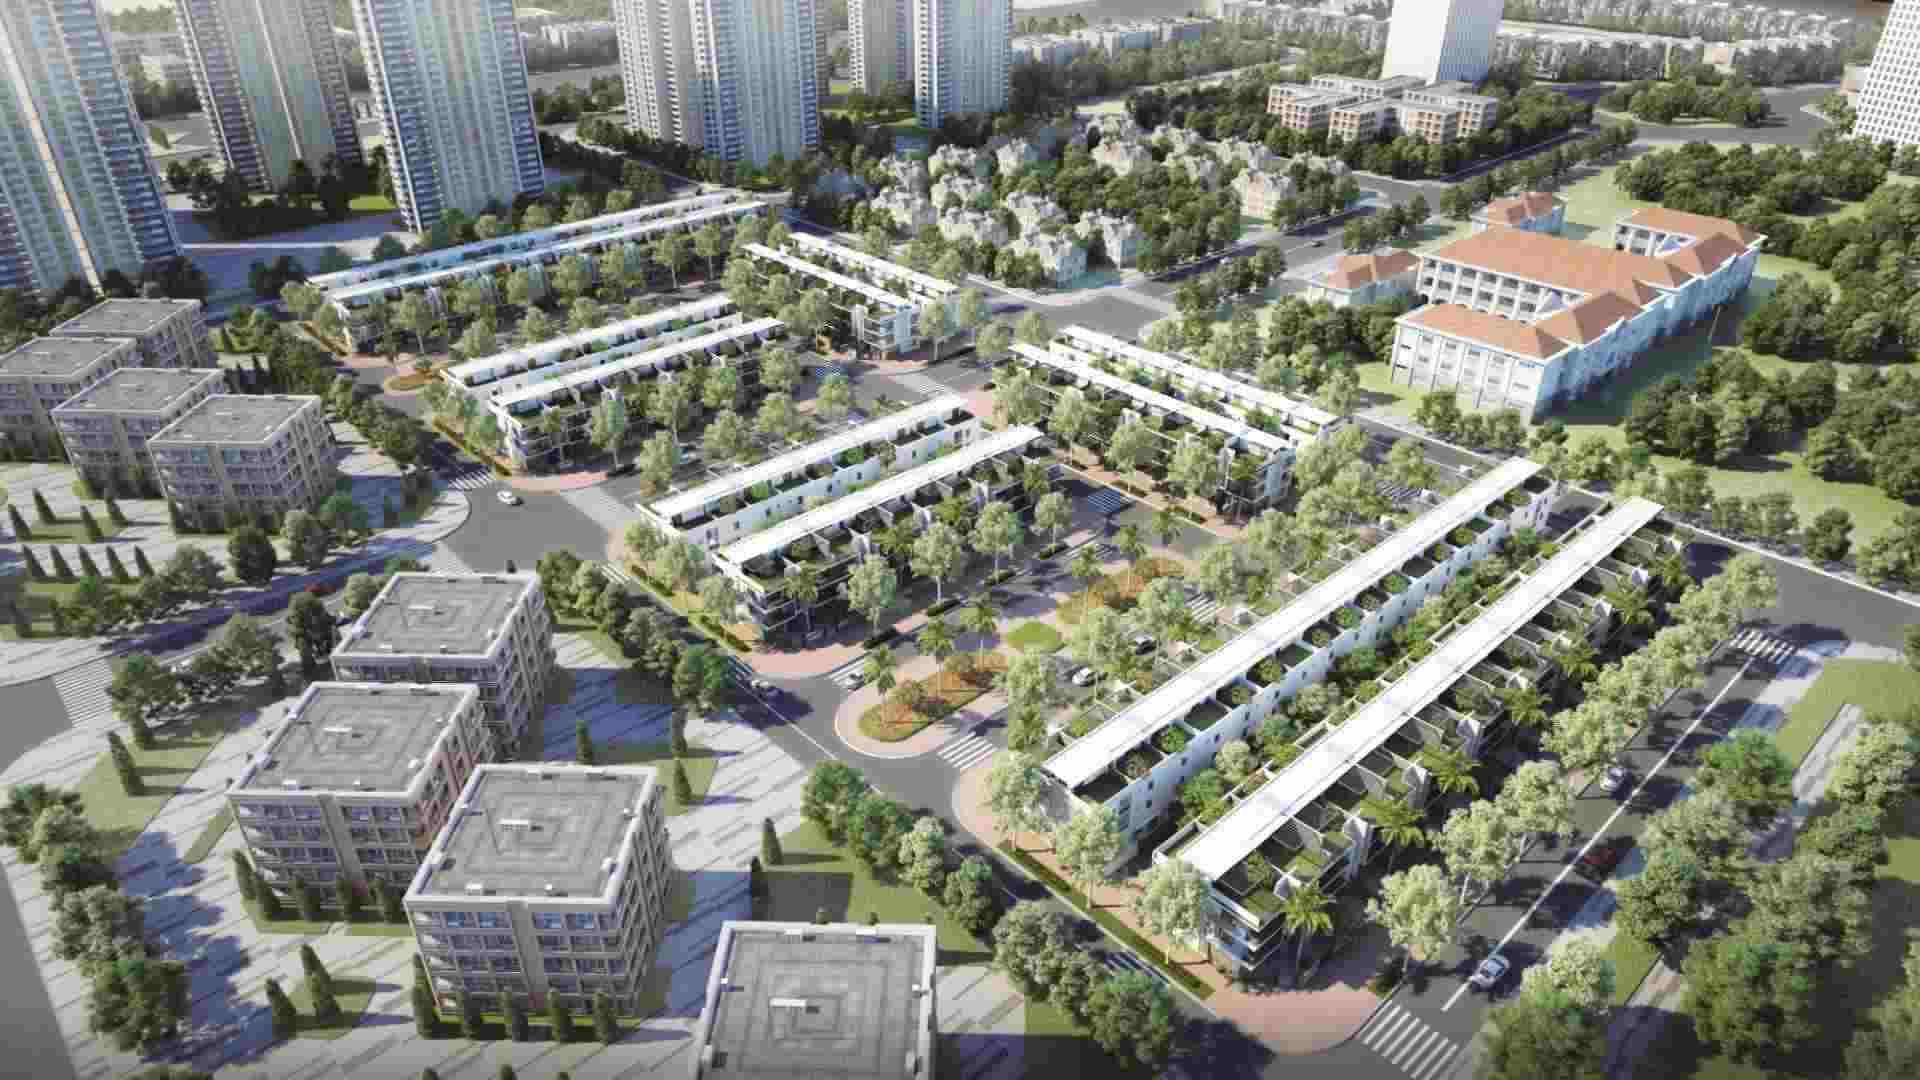 phoi-canh-du-an-an-phu-new-city